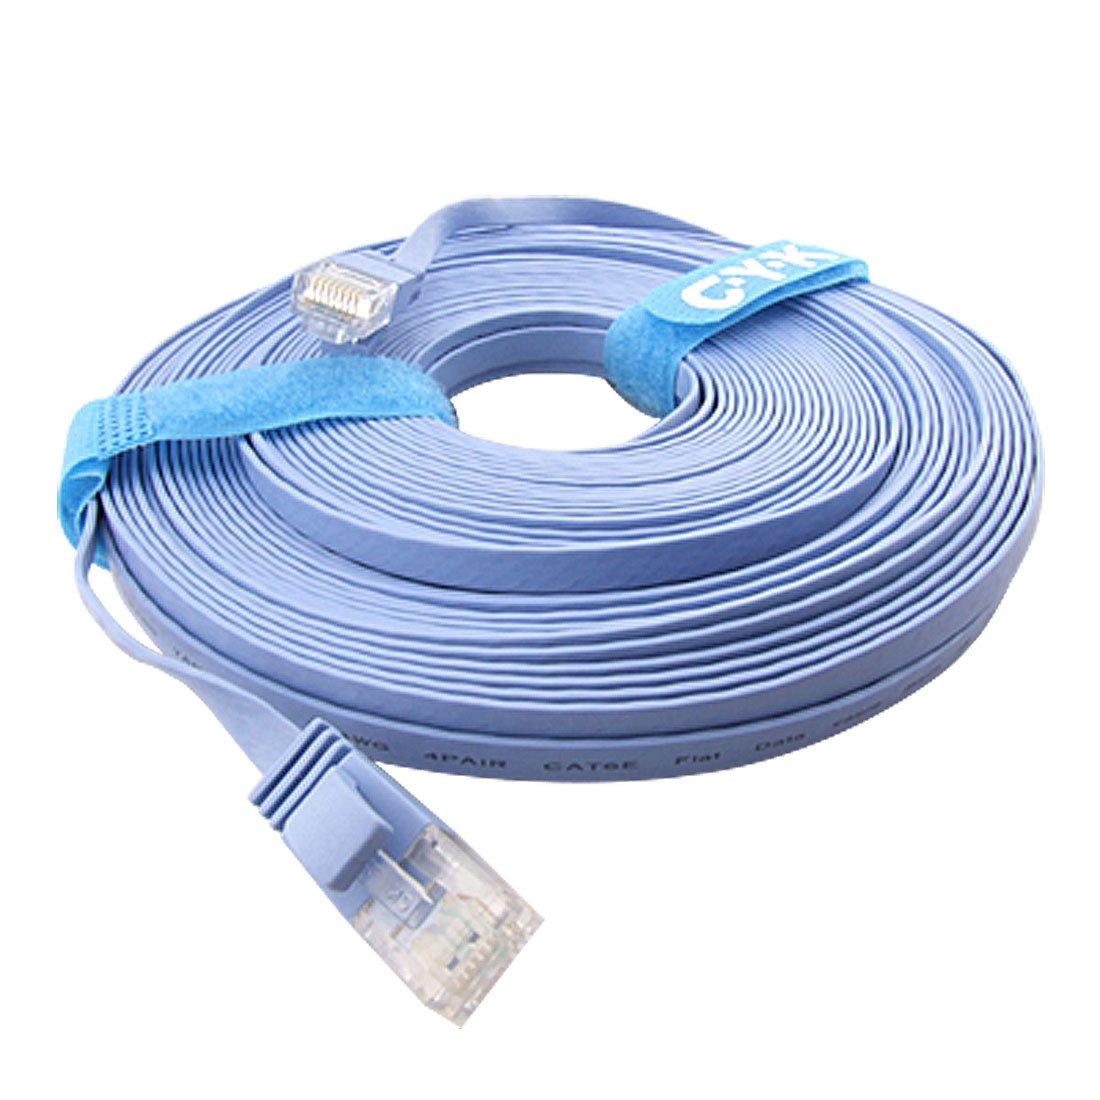 20m cat6 flat utp ethernet network cable rj45 patch lan cord blue q2g4 ebay - Cable ethernet 20m ...